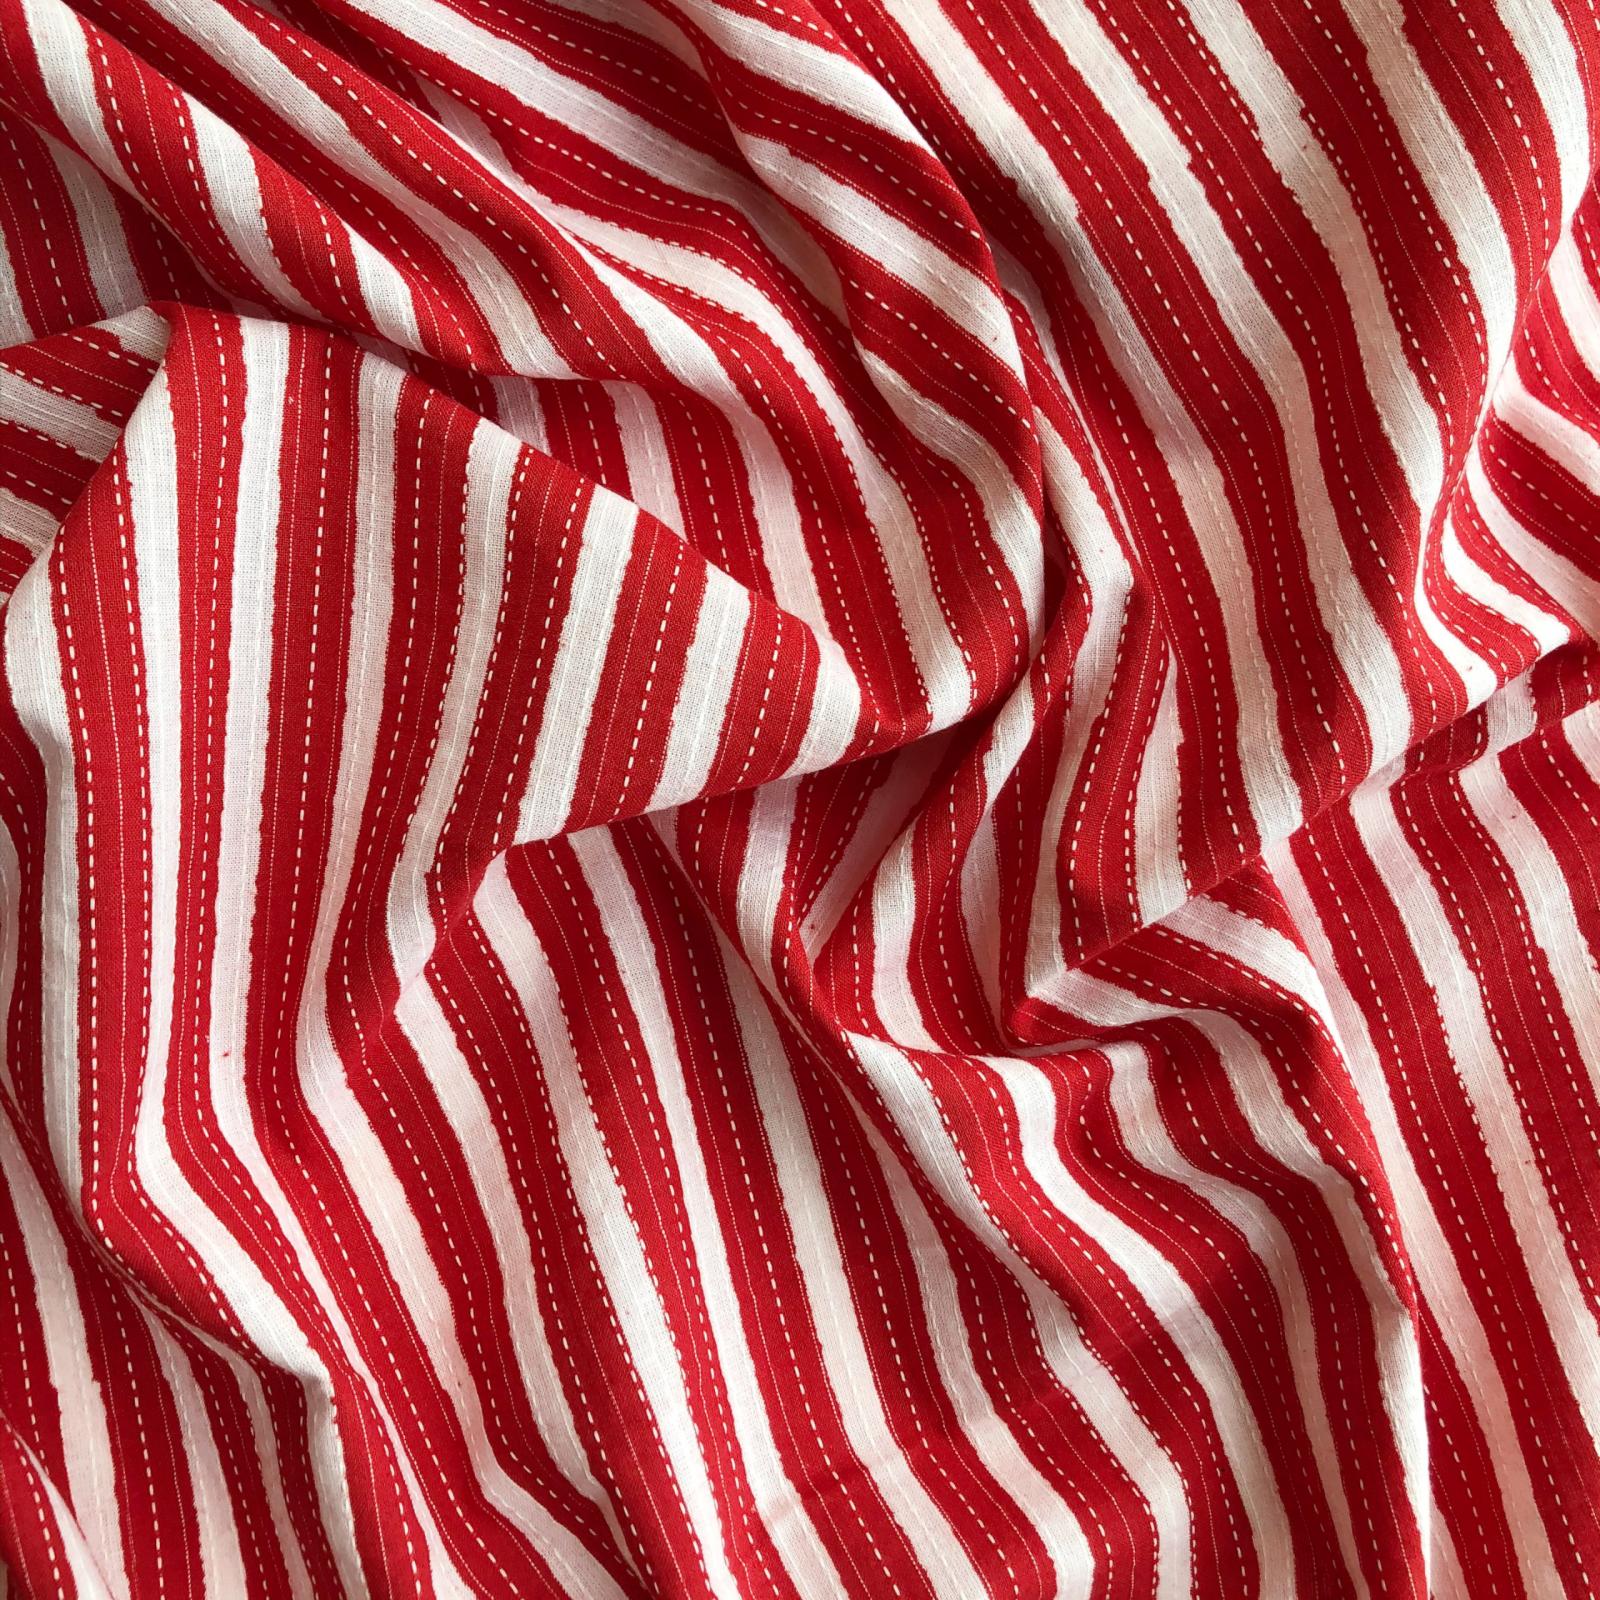 Remnant - Merchant & Mills Jaipur Cotton - Red Stitched Stripe - 1/3 yard